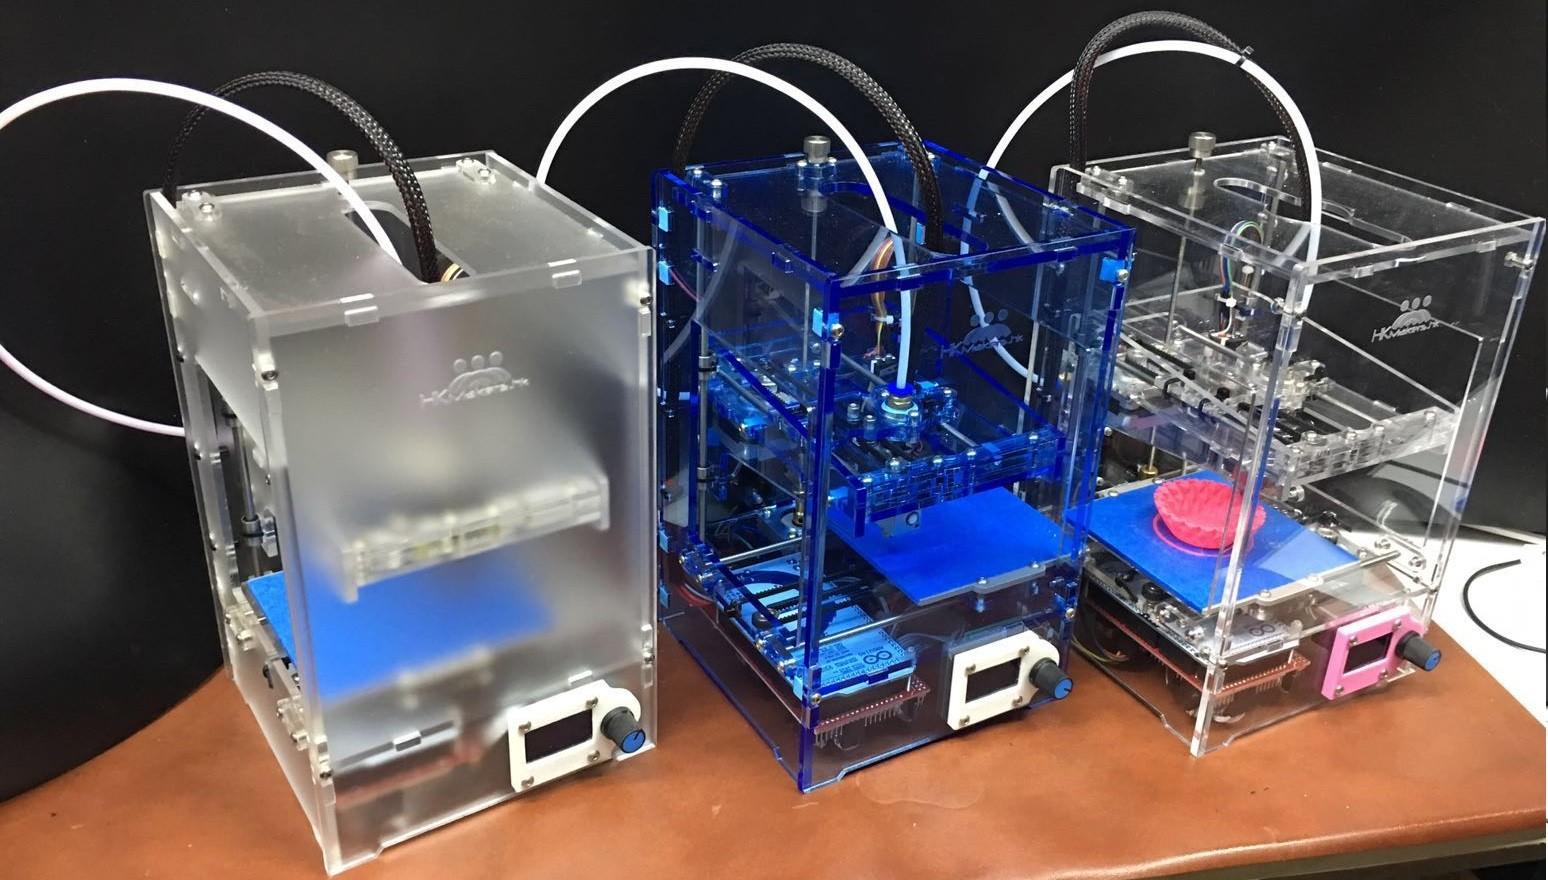 Tinyboy 2 E10 3D Printer